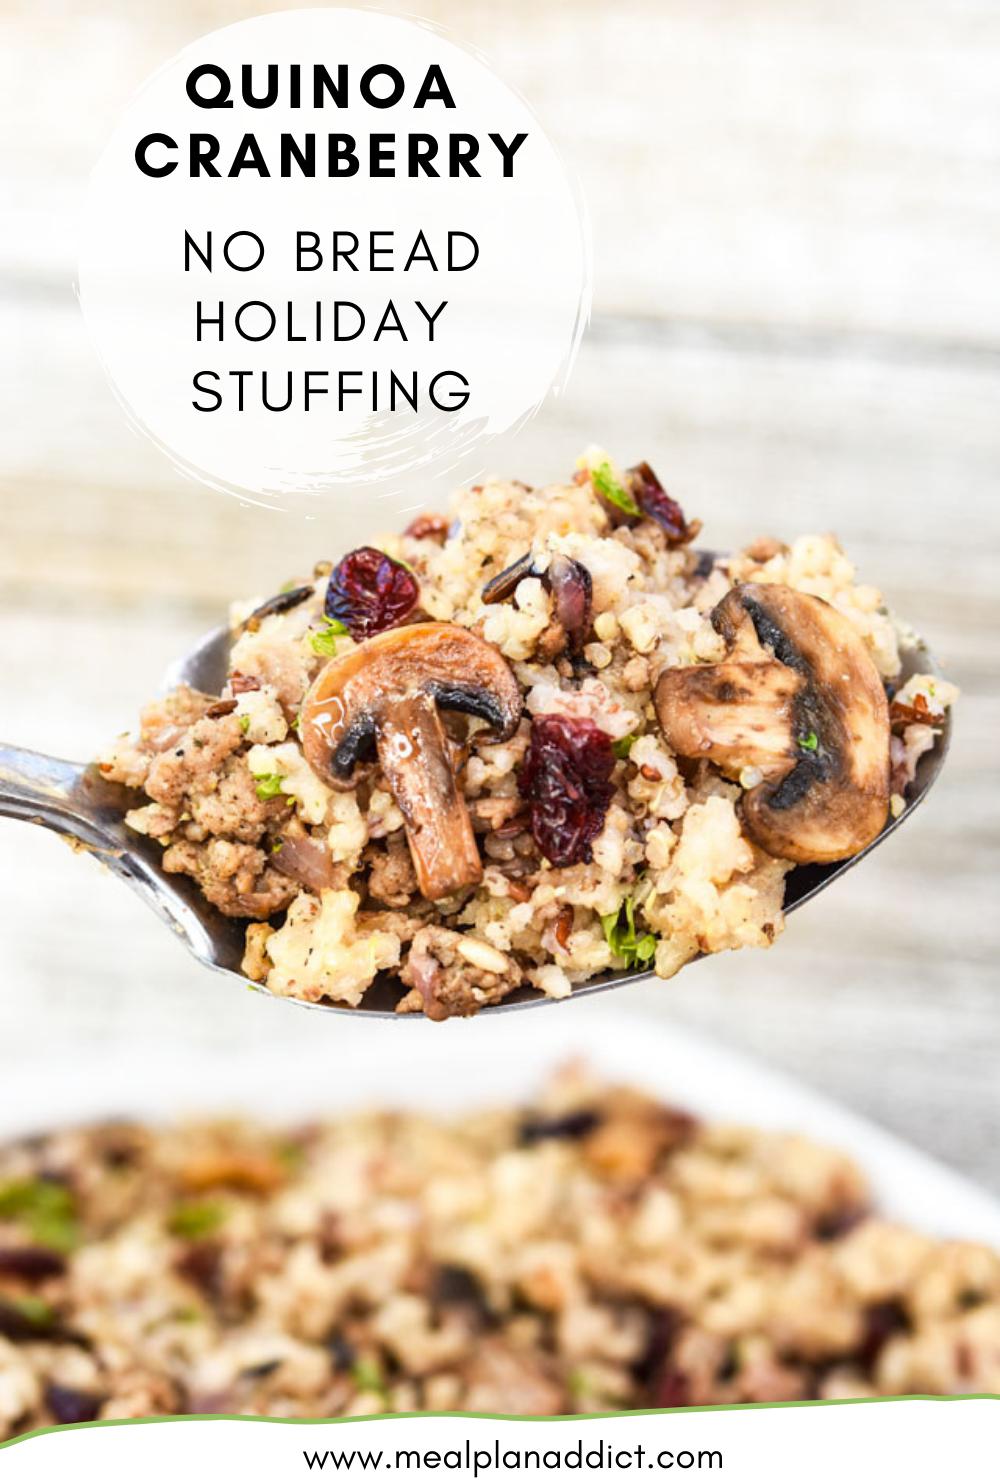 Quinoa Cranberry No Bread Holiday Stuffing